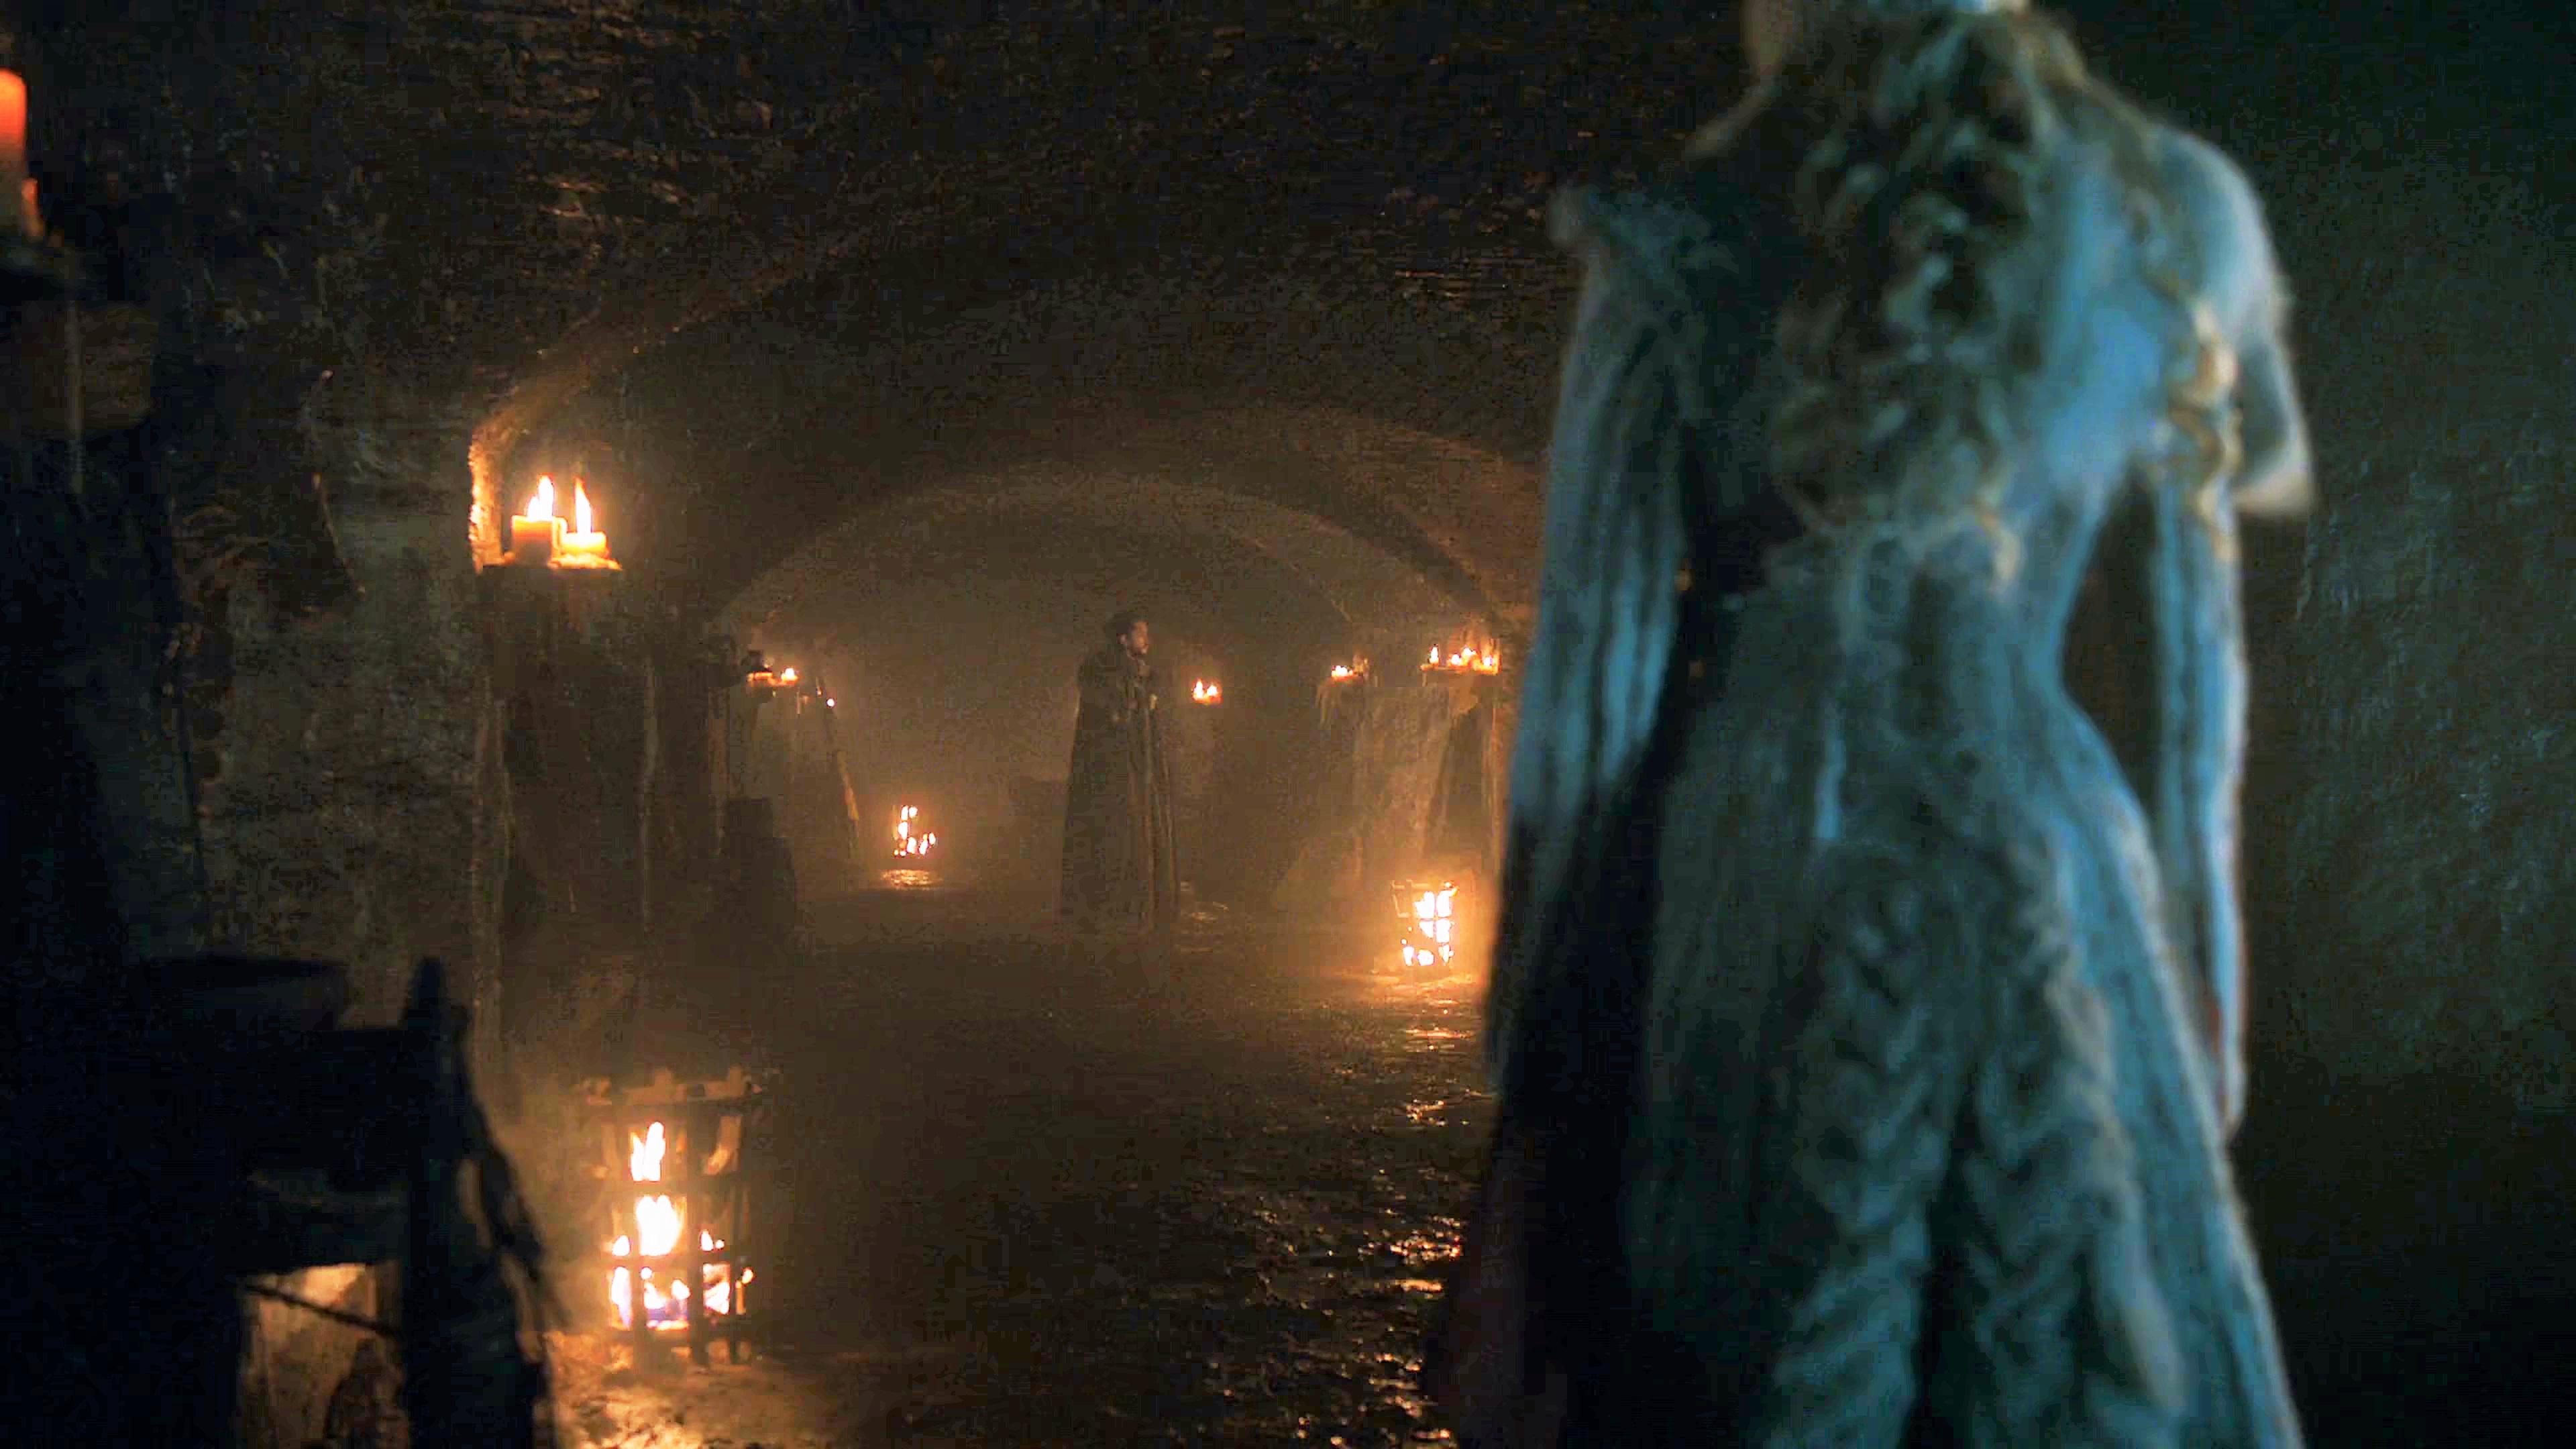 16. Season 8 Trailer Crypts Winterfell Daenerys Targaryen Jon Snow 1